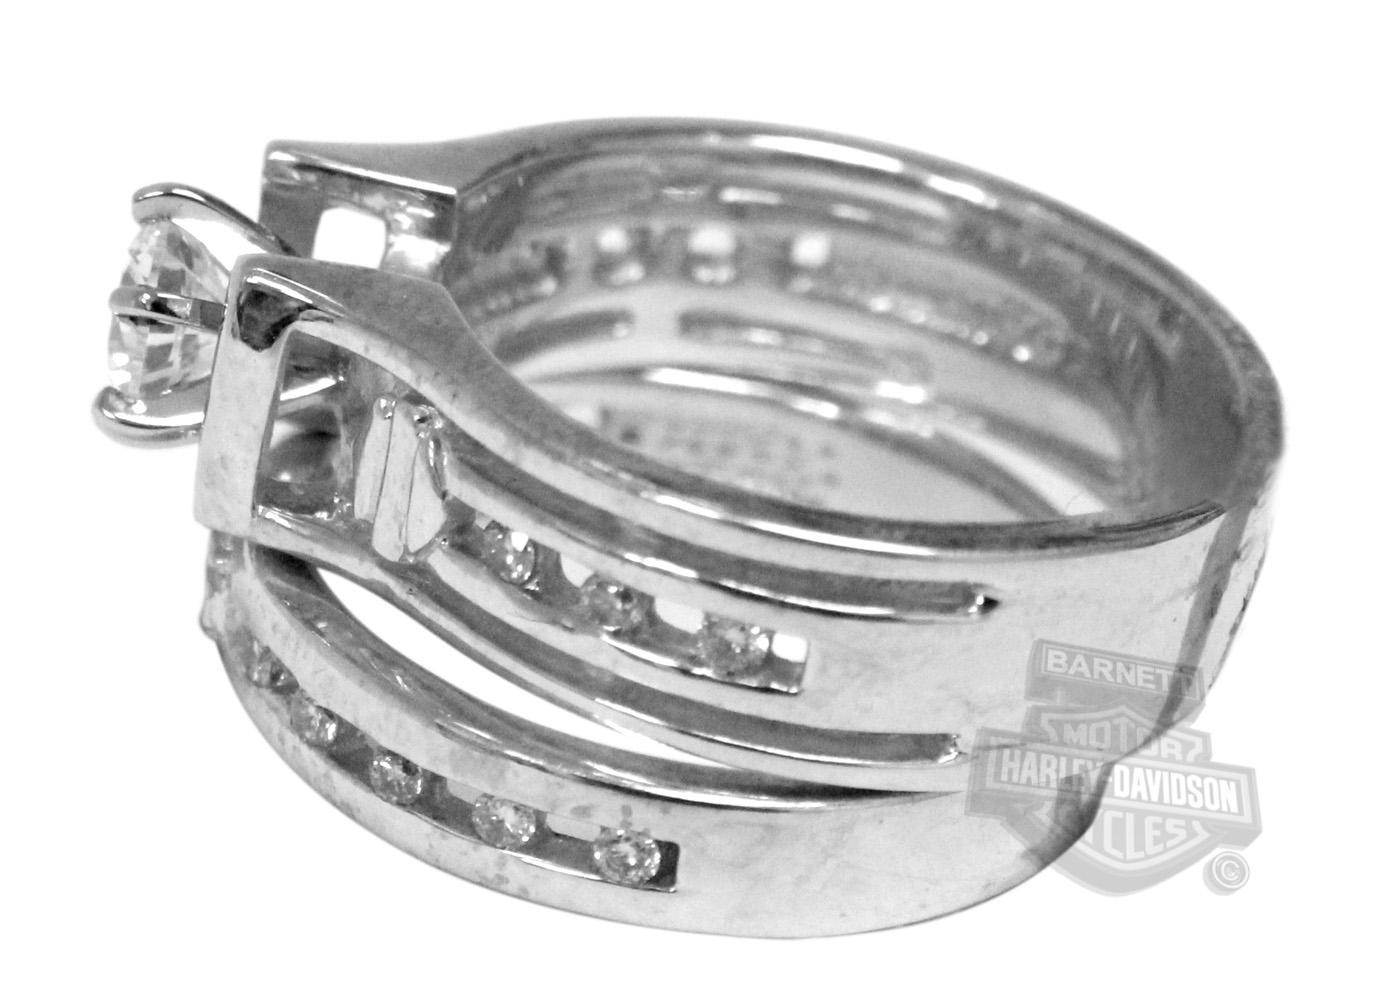 max size 1400 x 1001 - Harley Davidson Wedding Rings